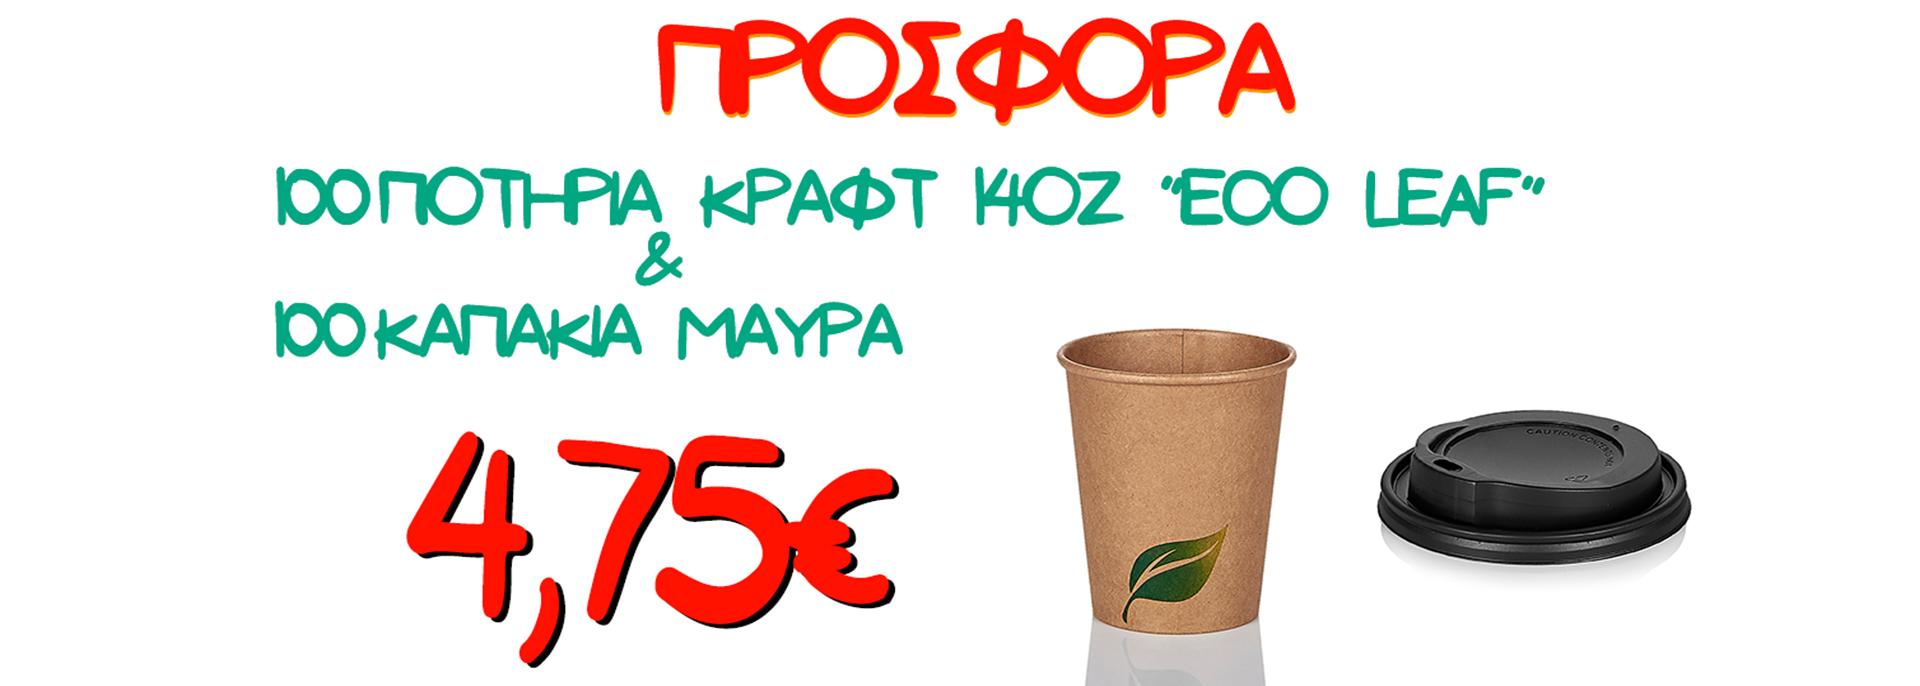 OFFER CRAFT CUPS ECO LEAF